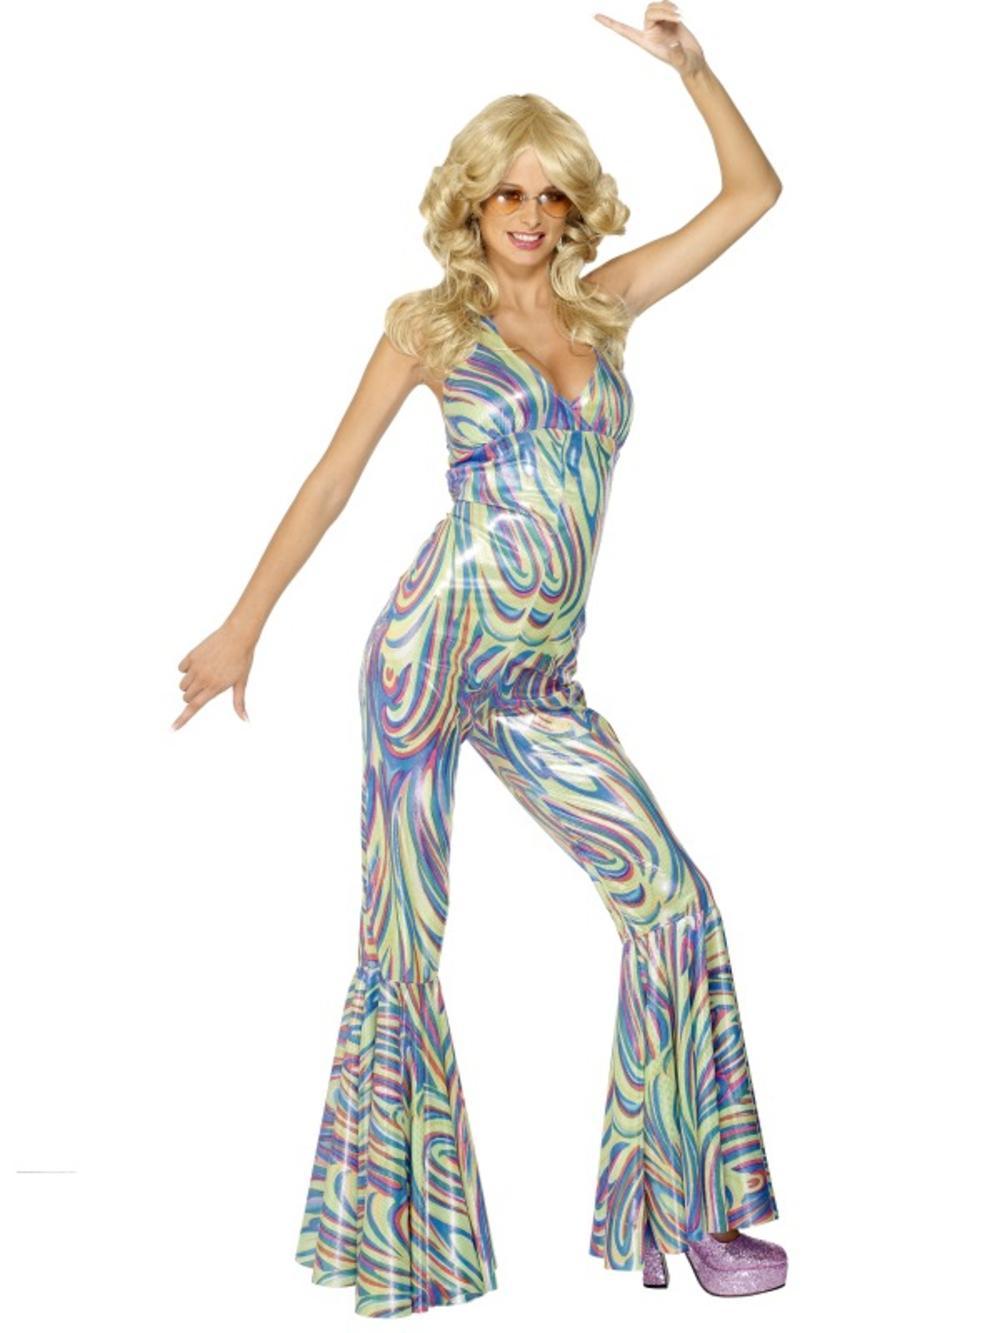 Dancing Queen Ladies Fancy Dress 1960s 70s Retro Celebrity Womens Costume Outfit